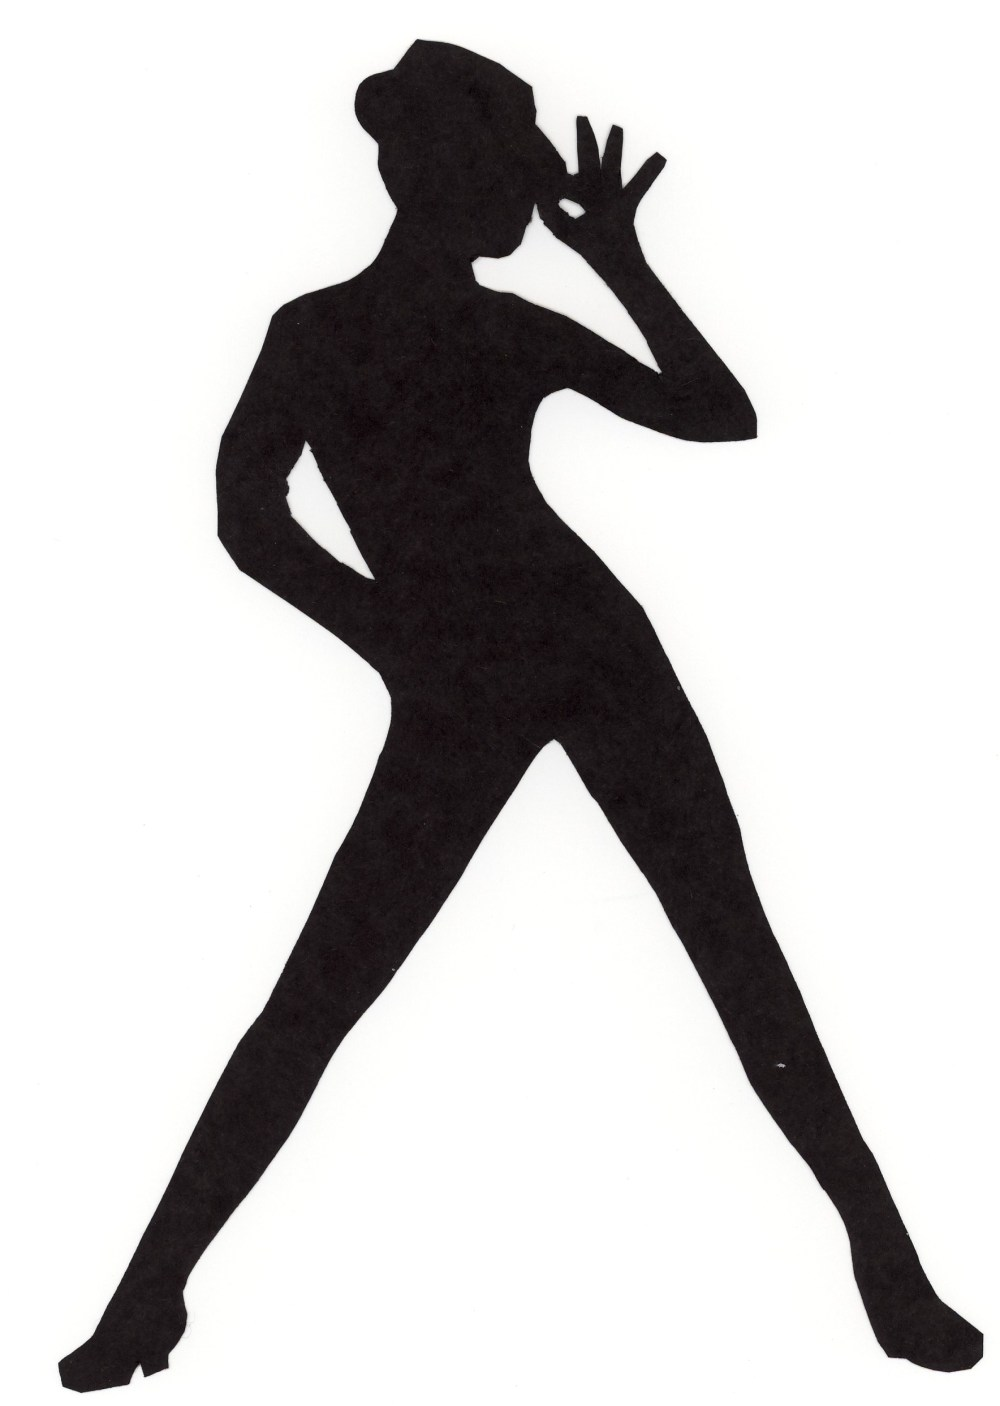 medium resolution of 1768x2487 jazz dancer png silhouette transparent jazz dancer silhouette png